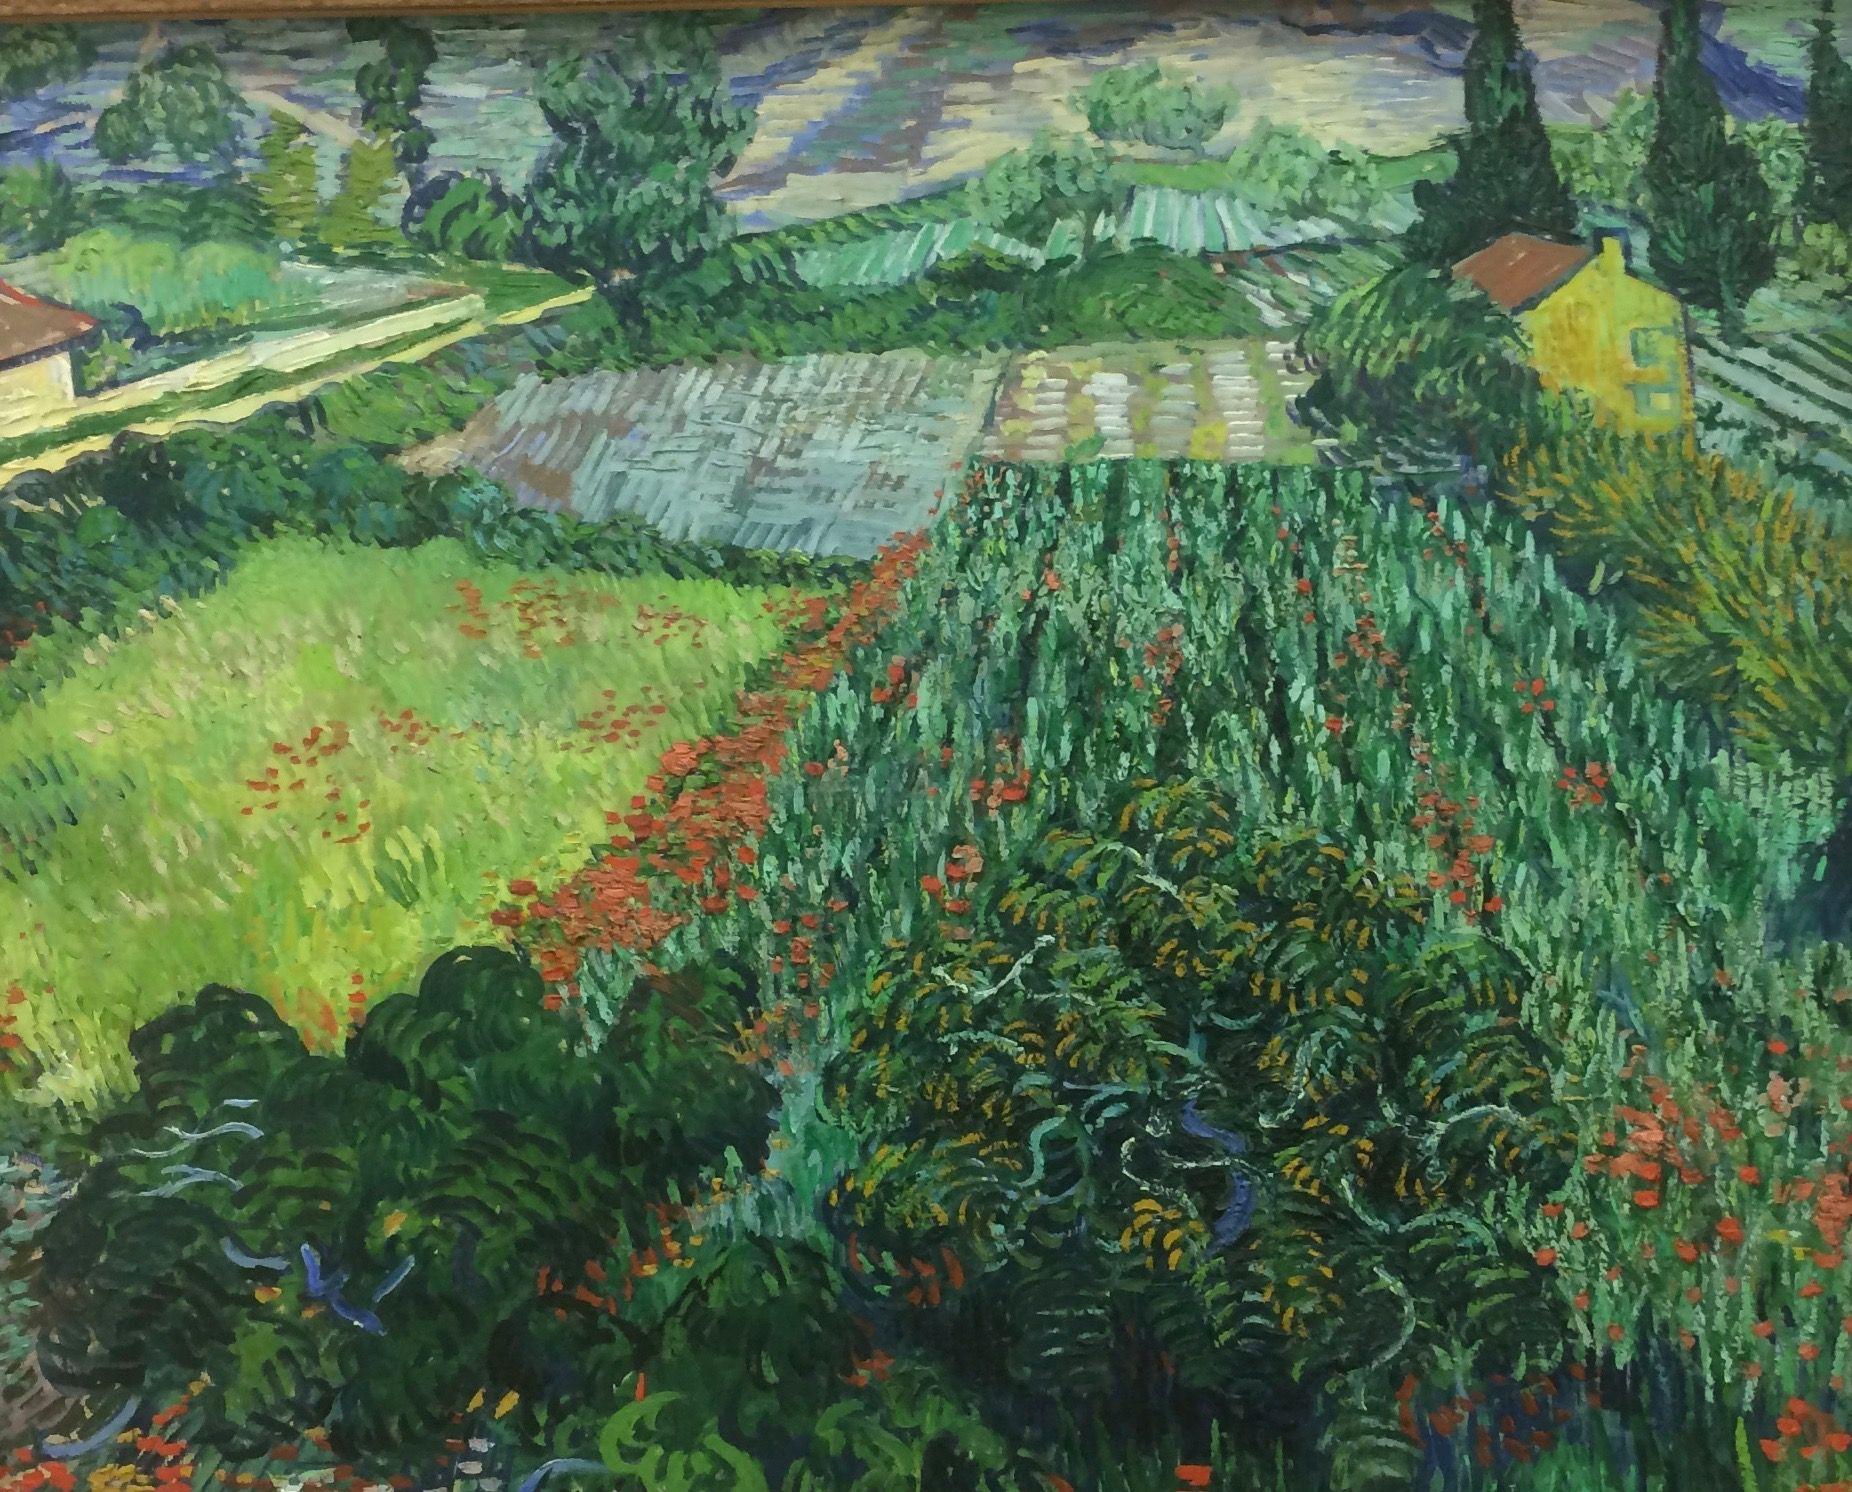 Van Gogh Mohnfeld 1889 Kunsthalle Bremen Vincent Van Gogh Paintings Van Gogh Art Artist Van Gogh